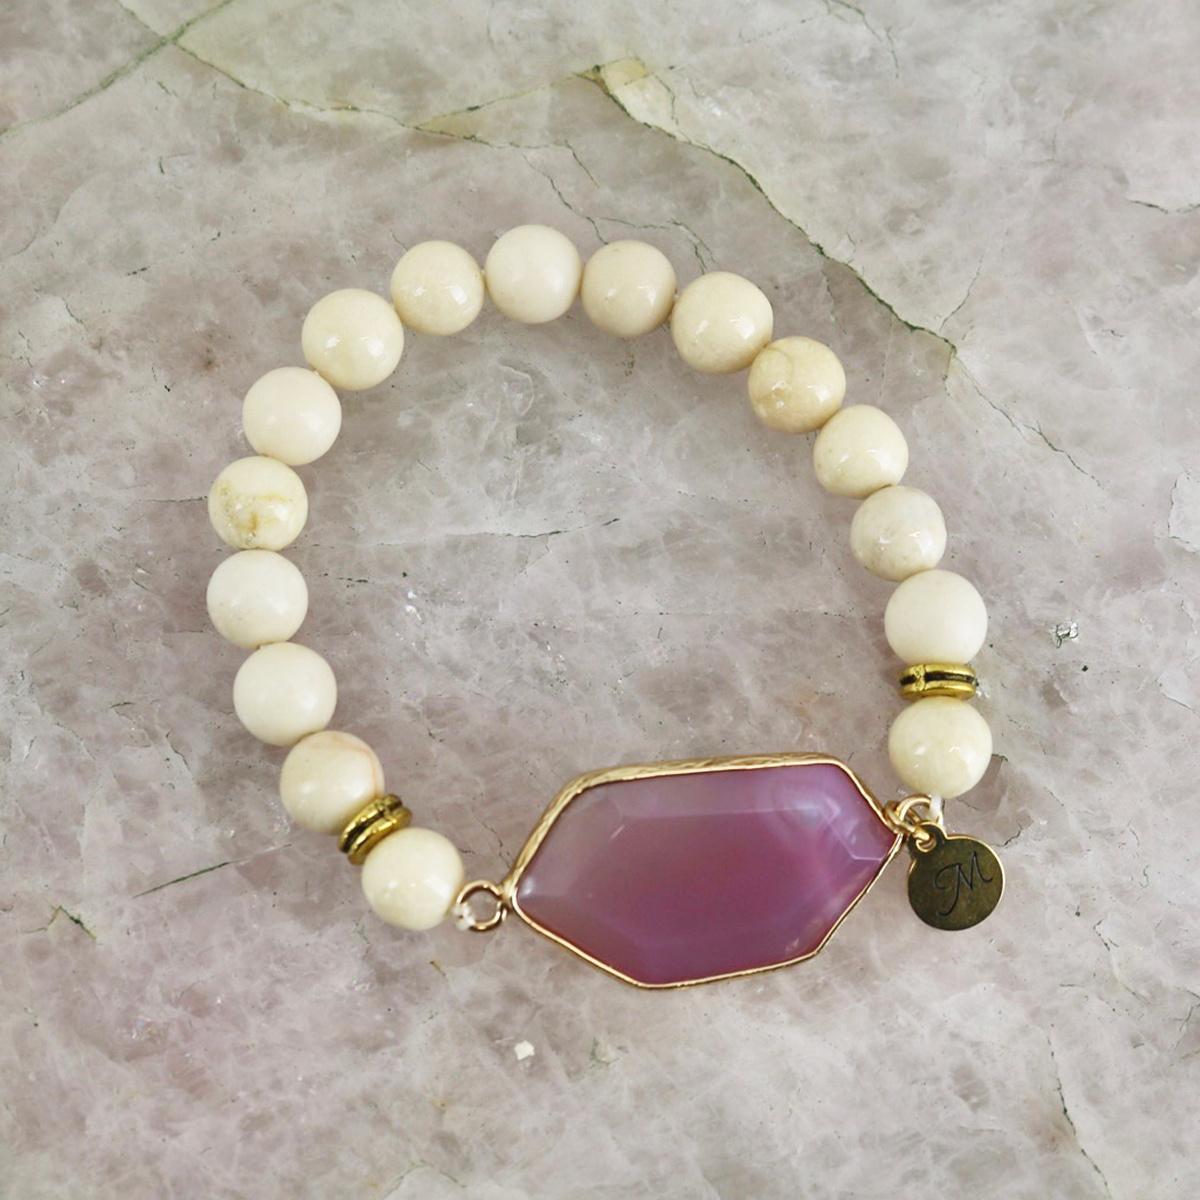 Royal Bracelet - Ivory Stone with Magenta Gem-1